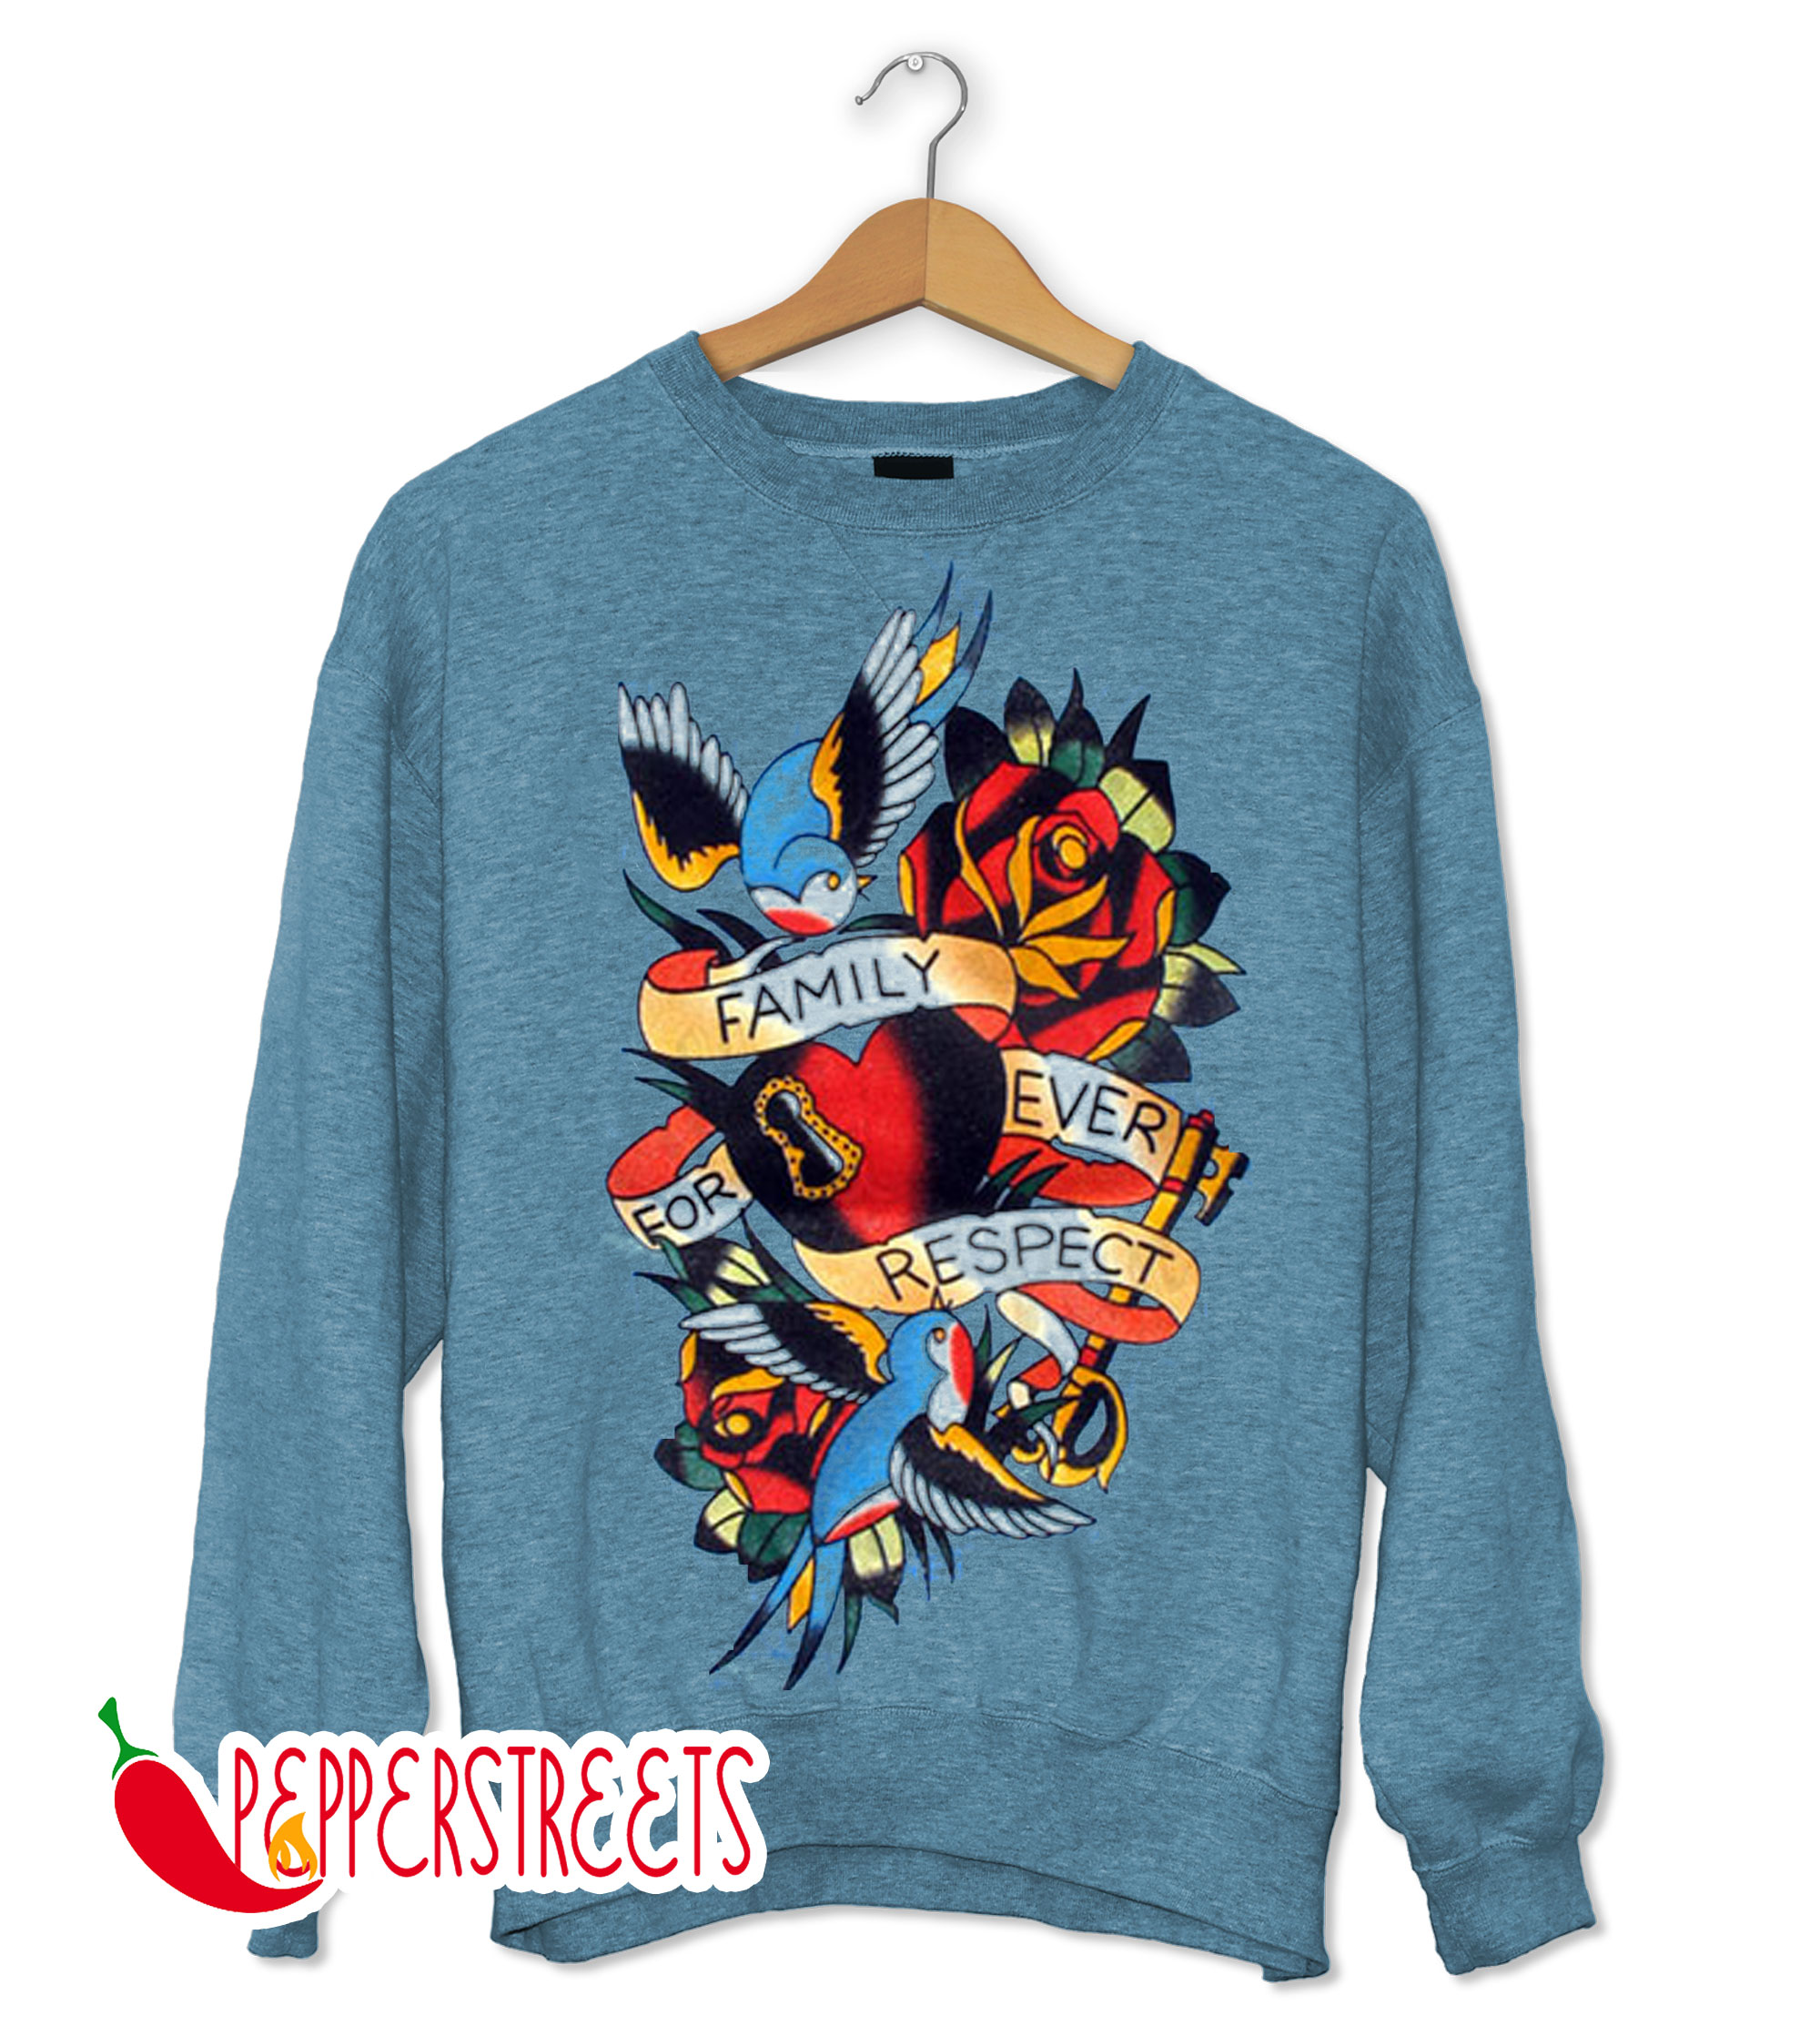 Family Forever Respect Baby Onesie Sweatshirt